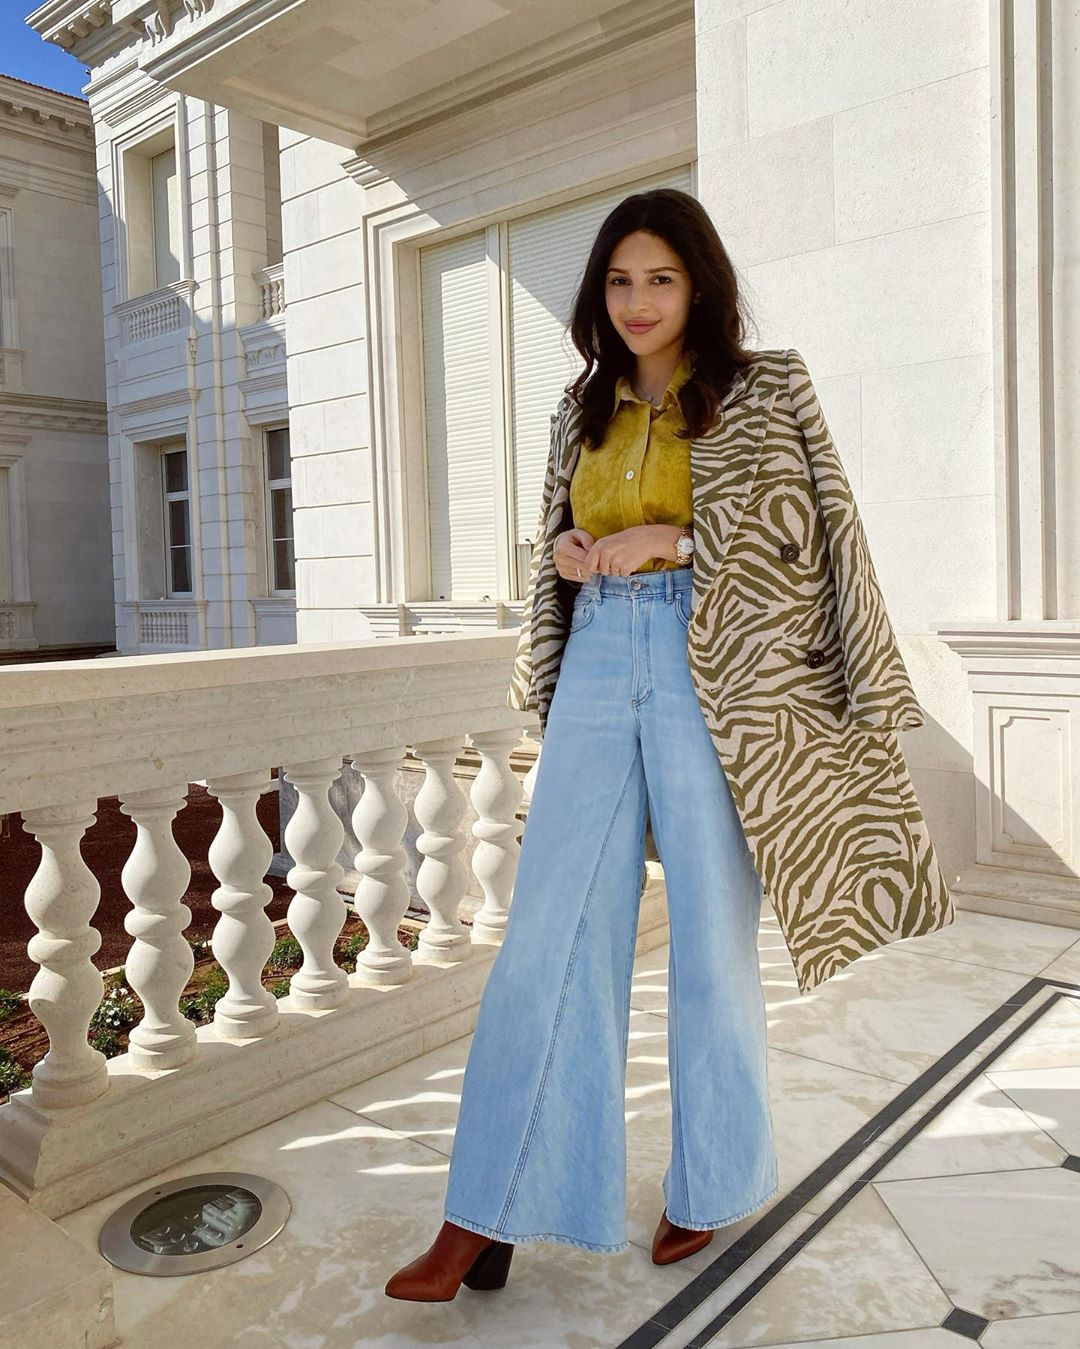 Дочь основателя холдинга «Стройгазконсалтинг» Зияда Манасира Диана: пальто See by Chloé, 60028 руб. на farfetch.com